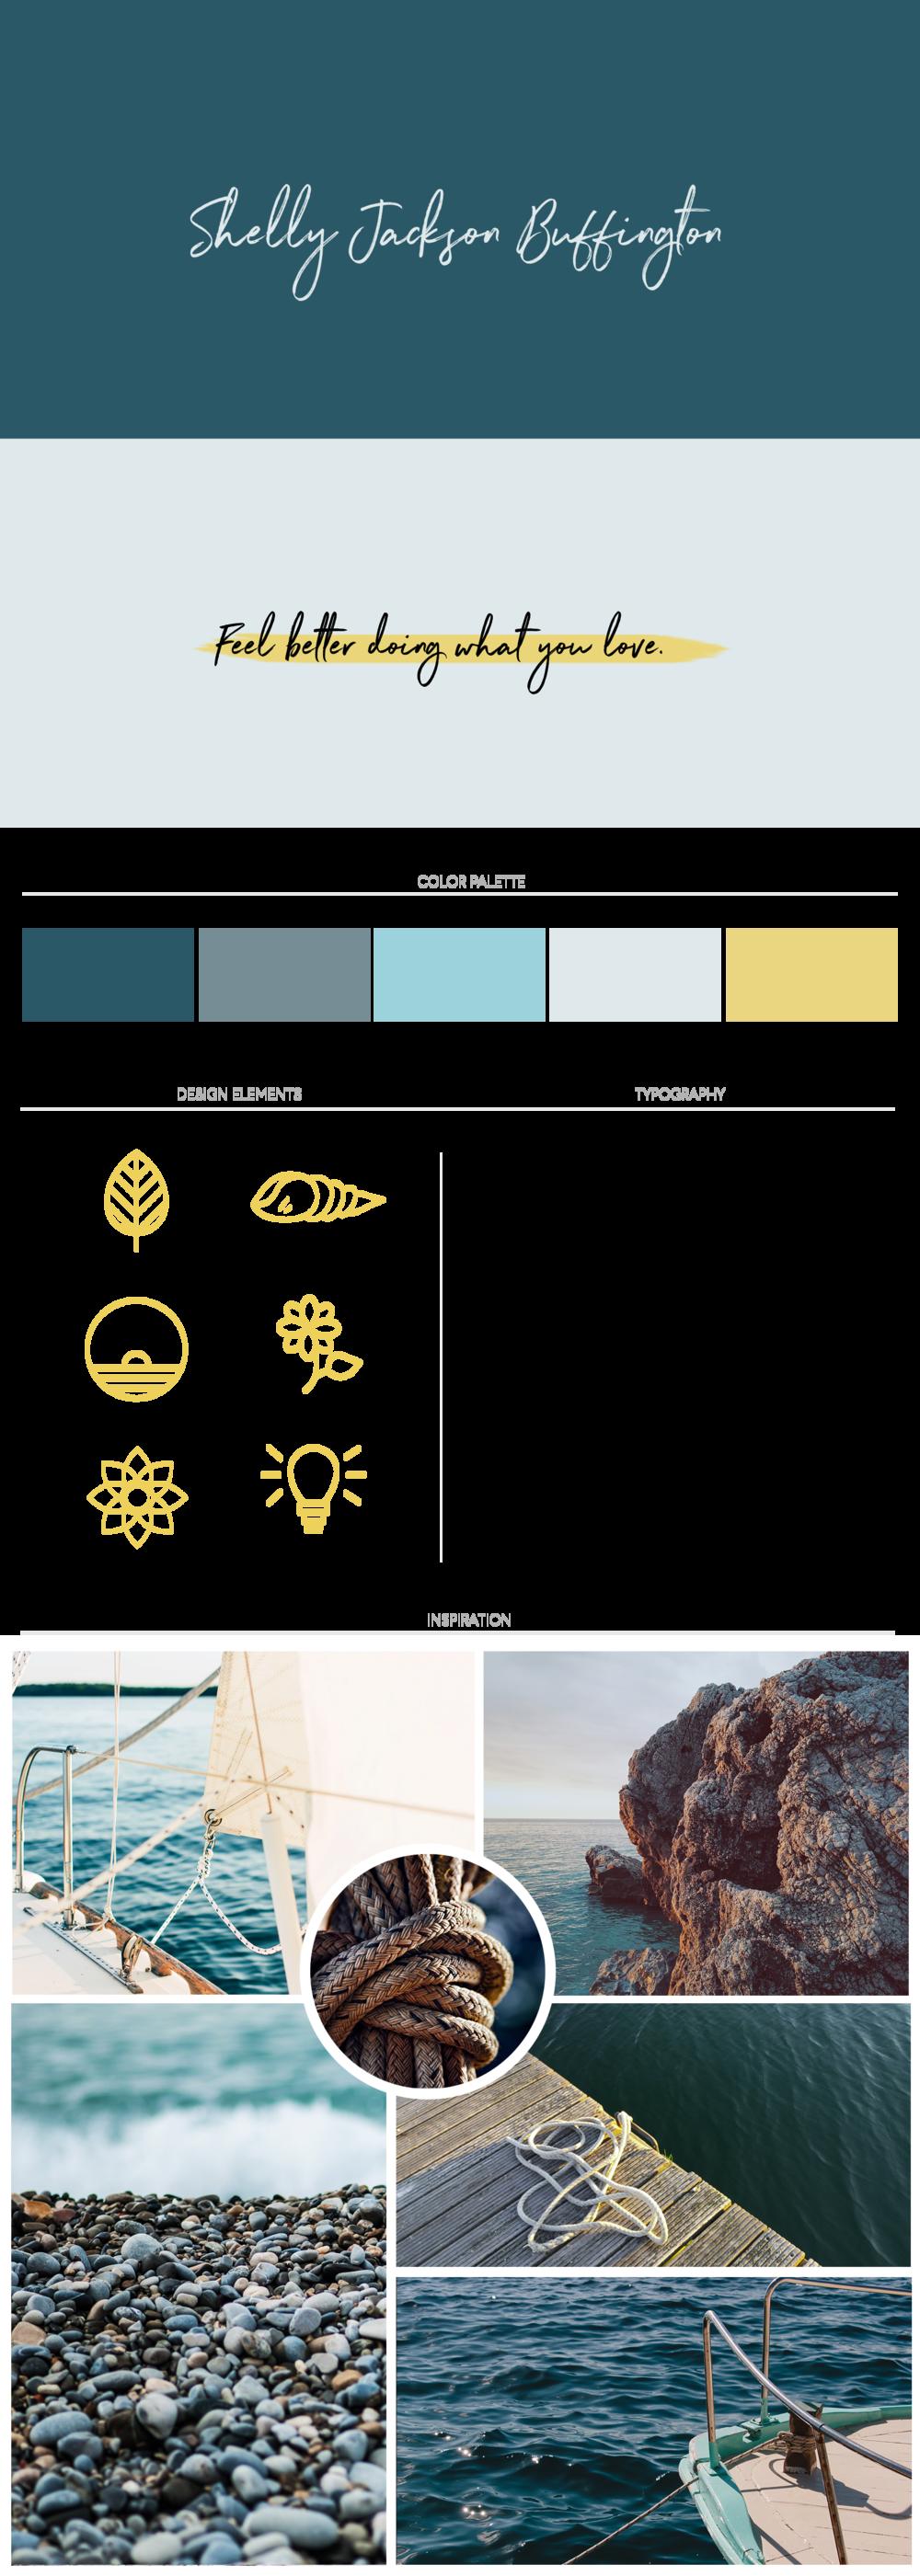 Branding project for Shelly. Salt and sea inspired branding. Beach girl meets adventurer. Branding board by Callie Cullum.